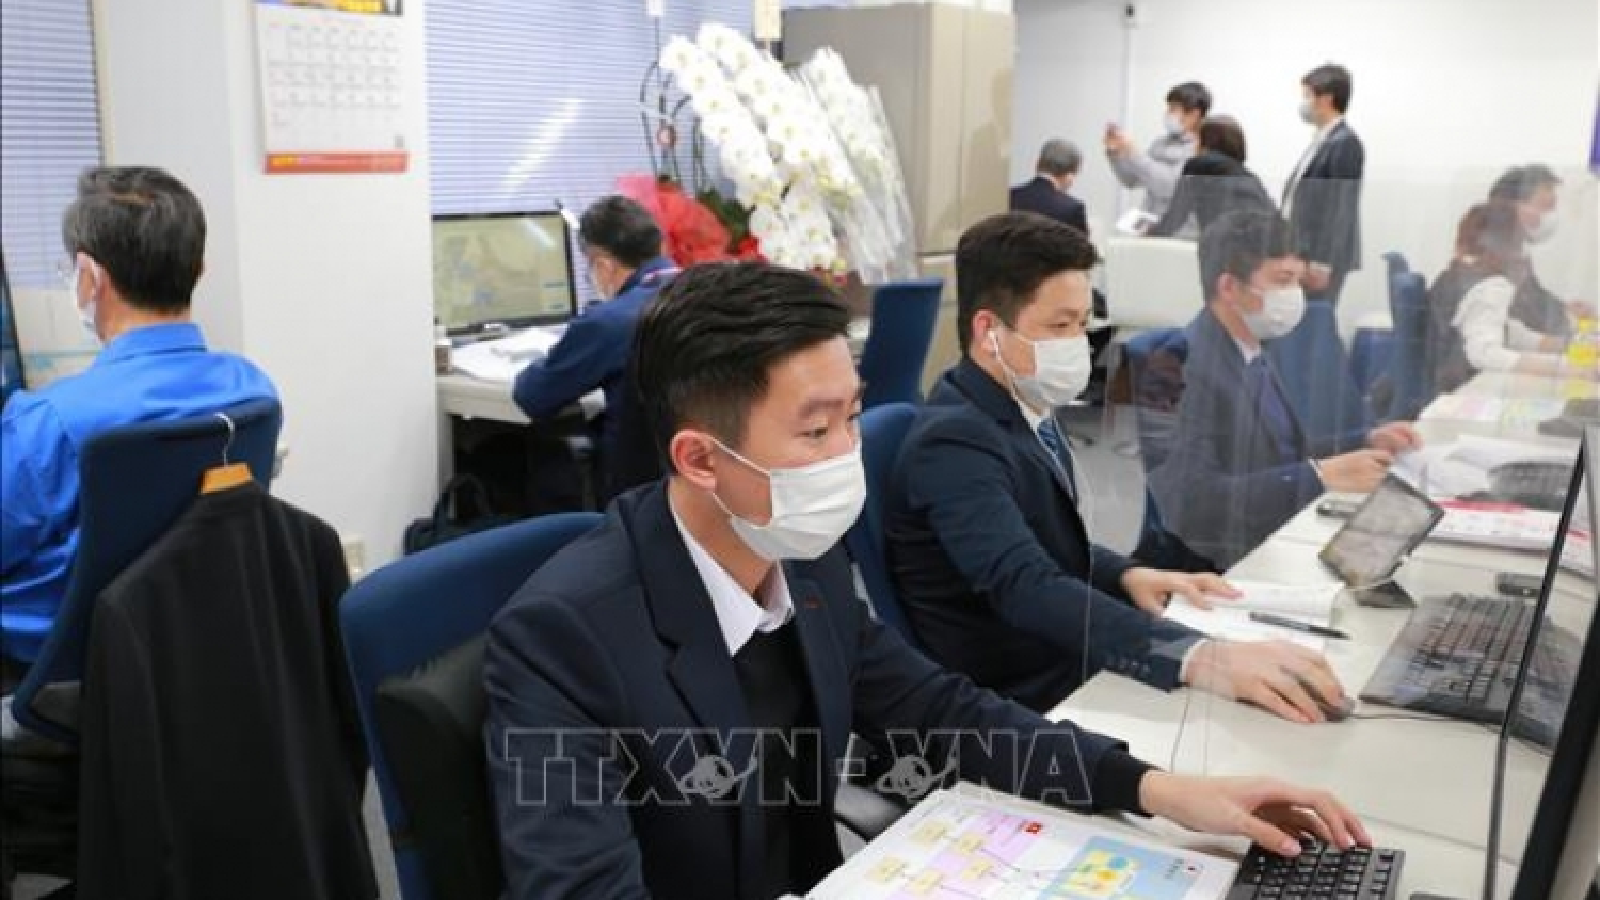 Dentsu Japan commends Vietnamese engineers for skills, attitude